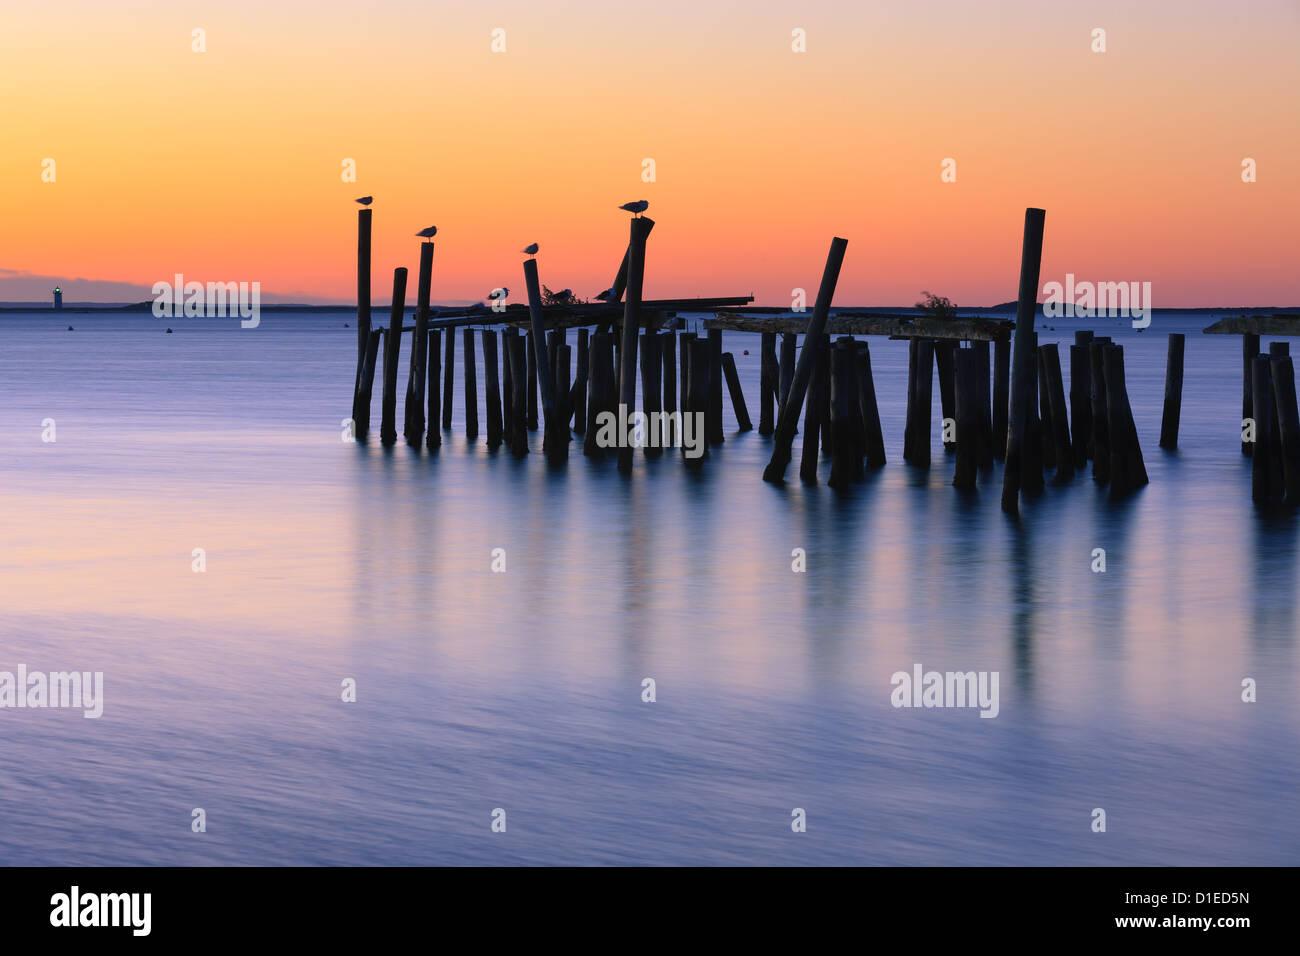 Amanecer sobre el antiguo jety en Provincetown en el norte de Cape Cod, Massachusetts Imagen De Stock